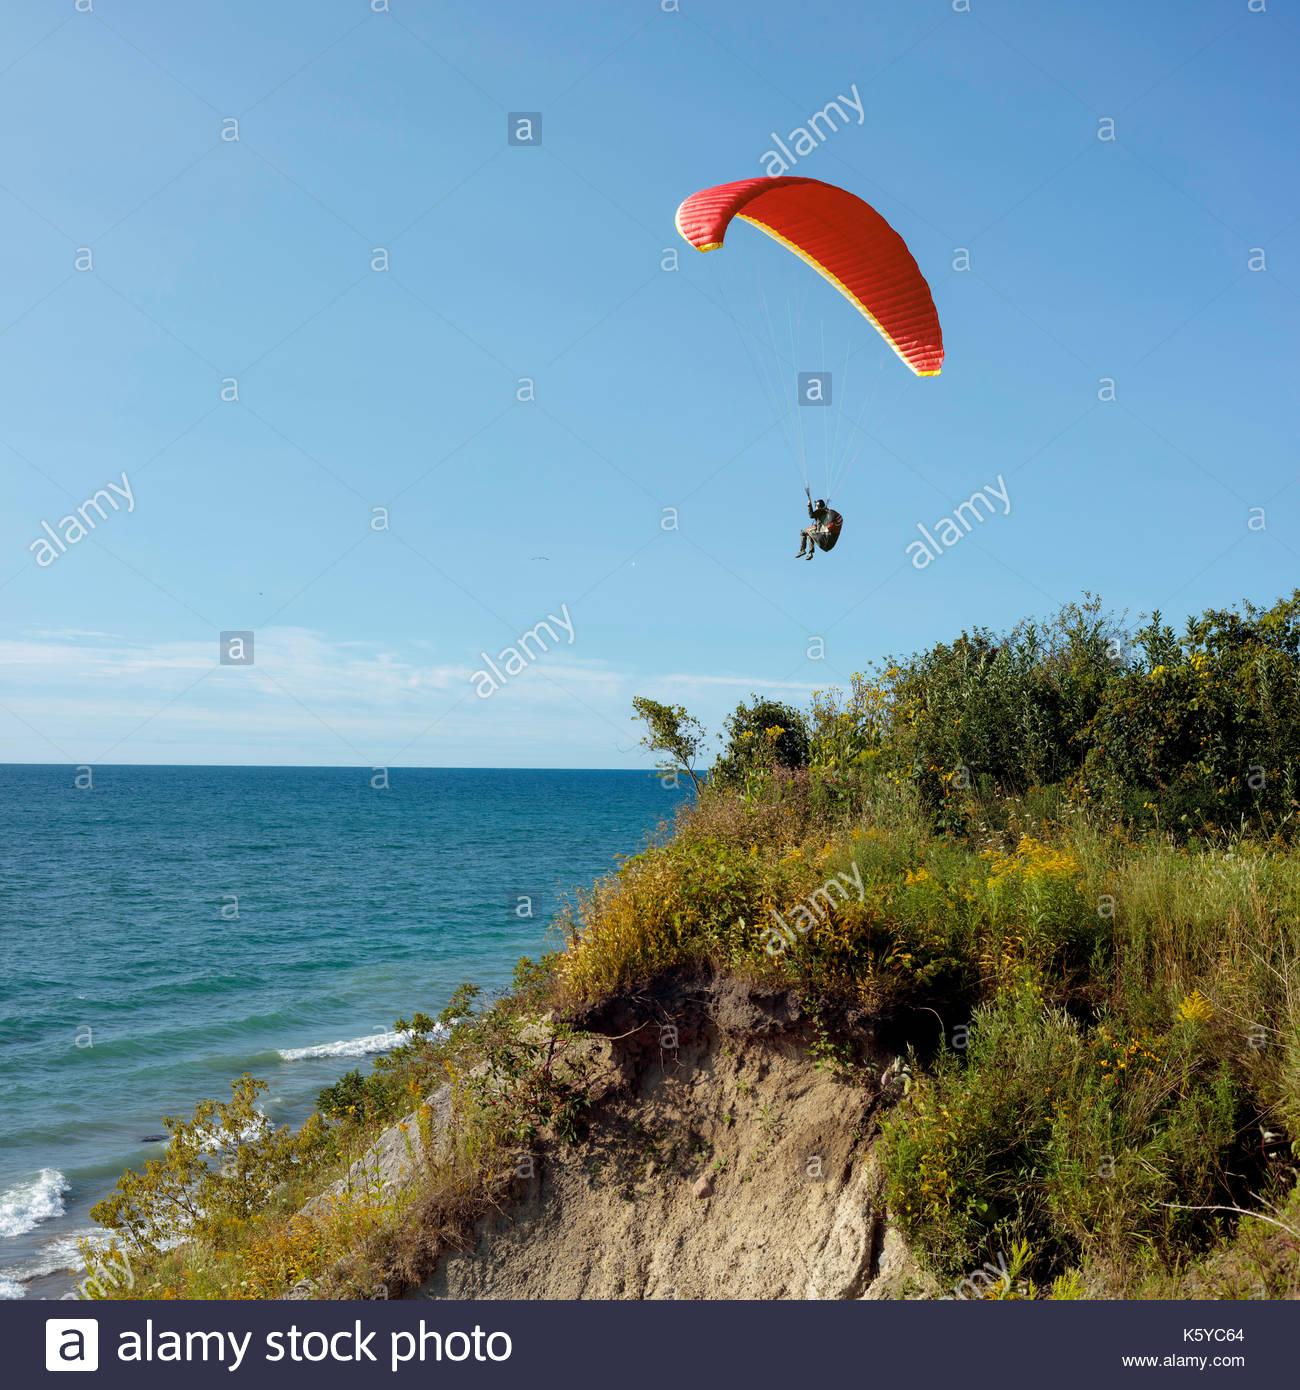 Paragliding toronto ontario